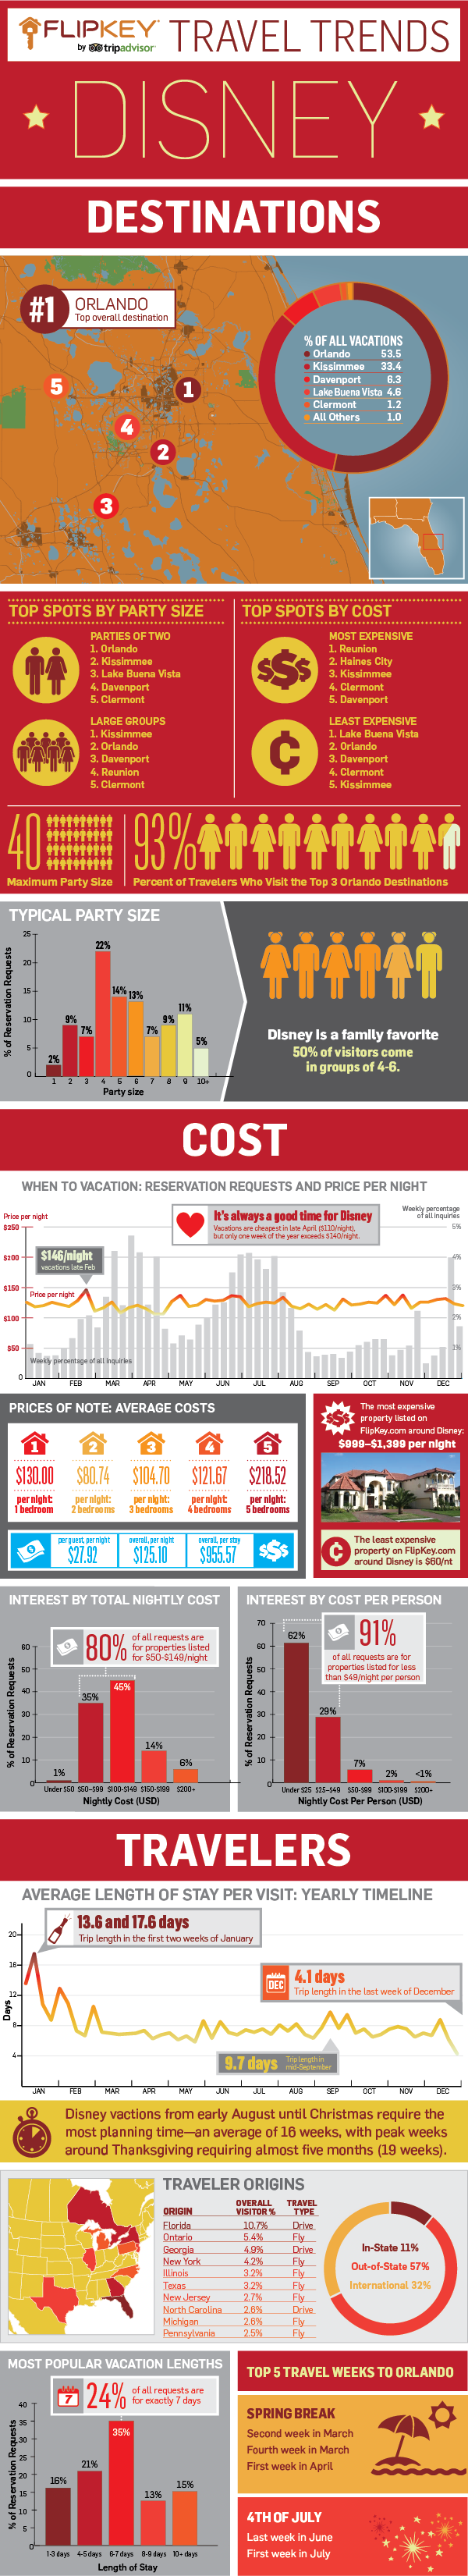 Walt Disney World Trends in every aspect of vacation trip key